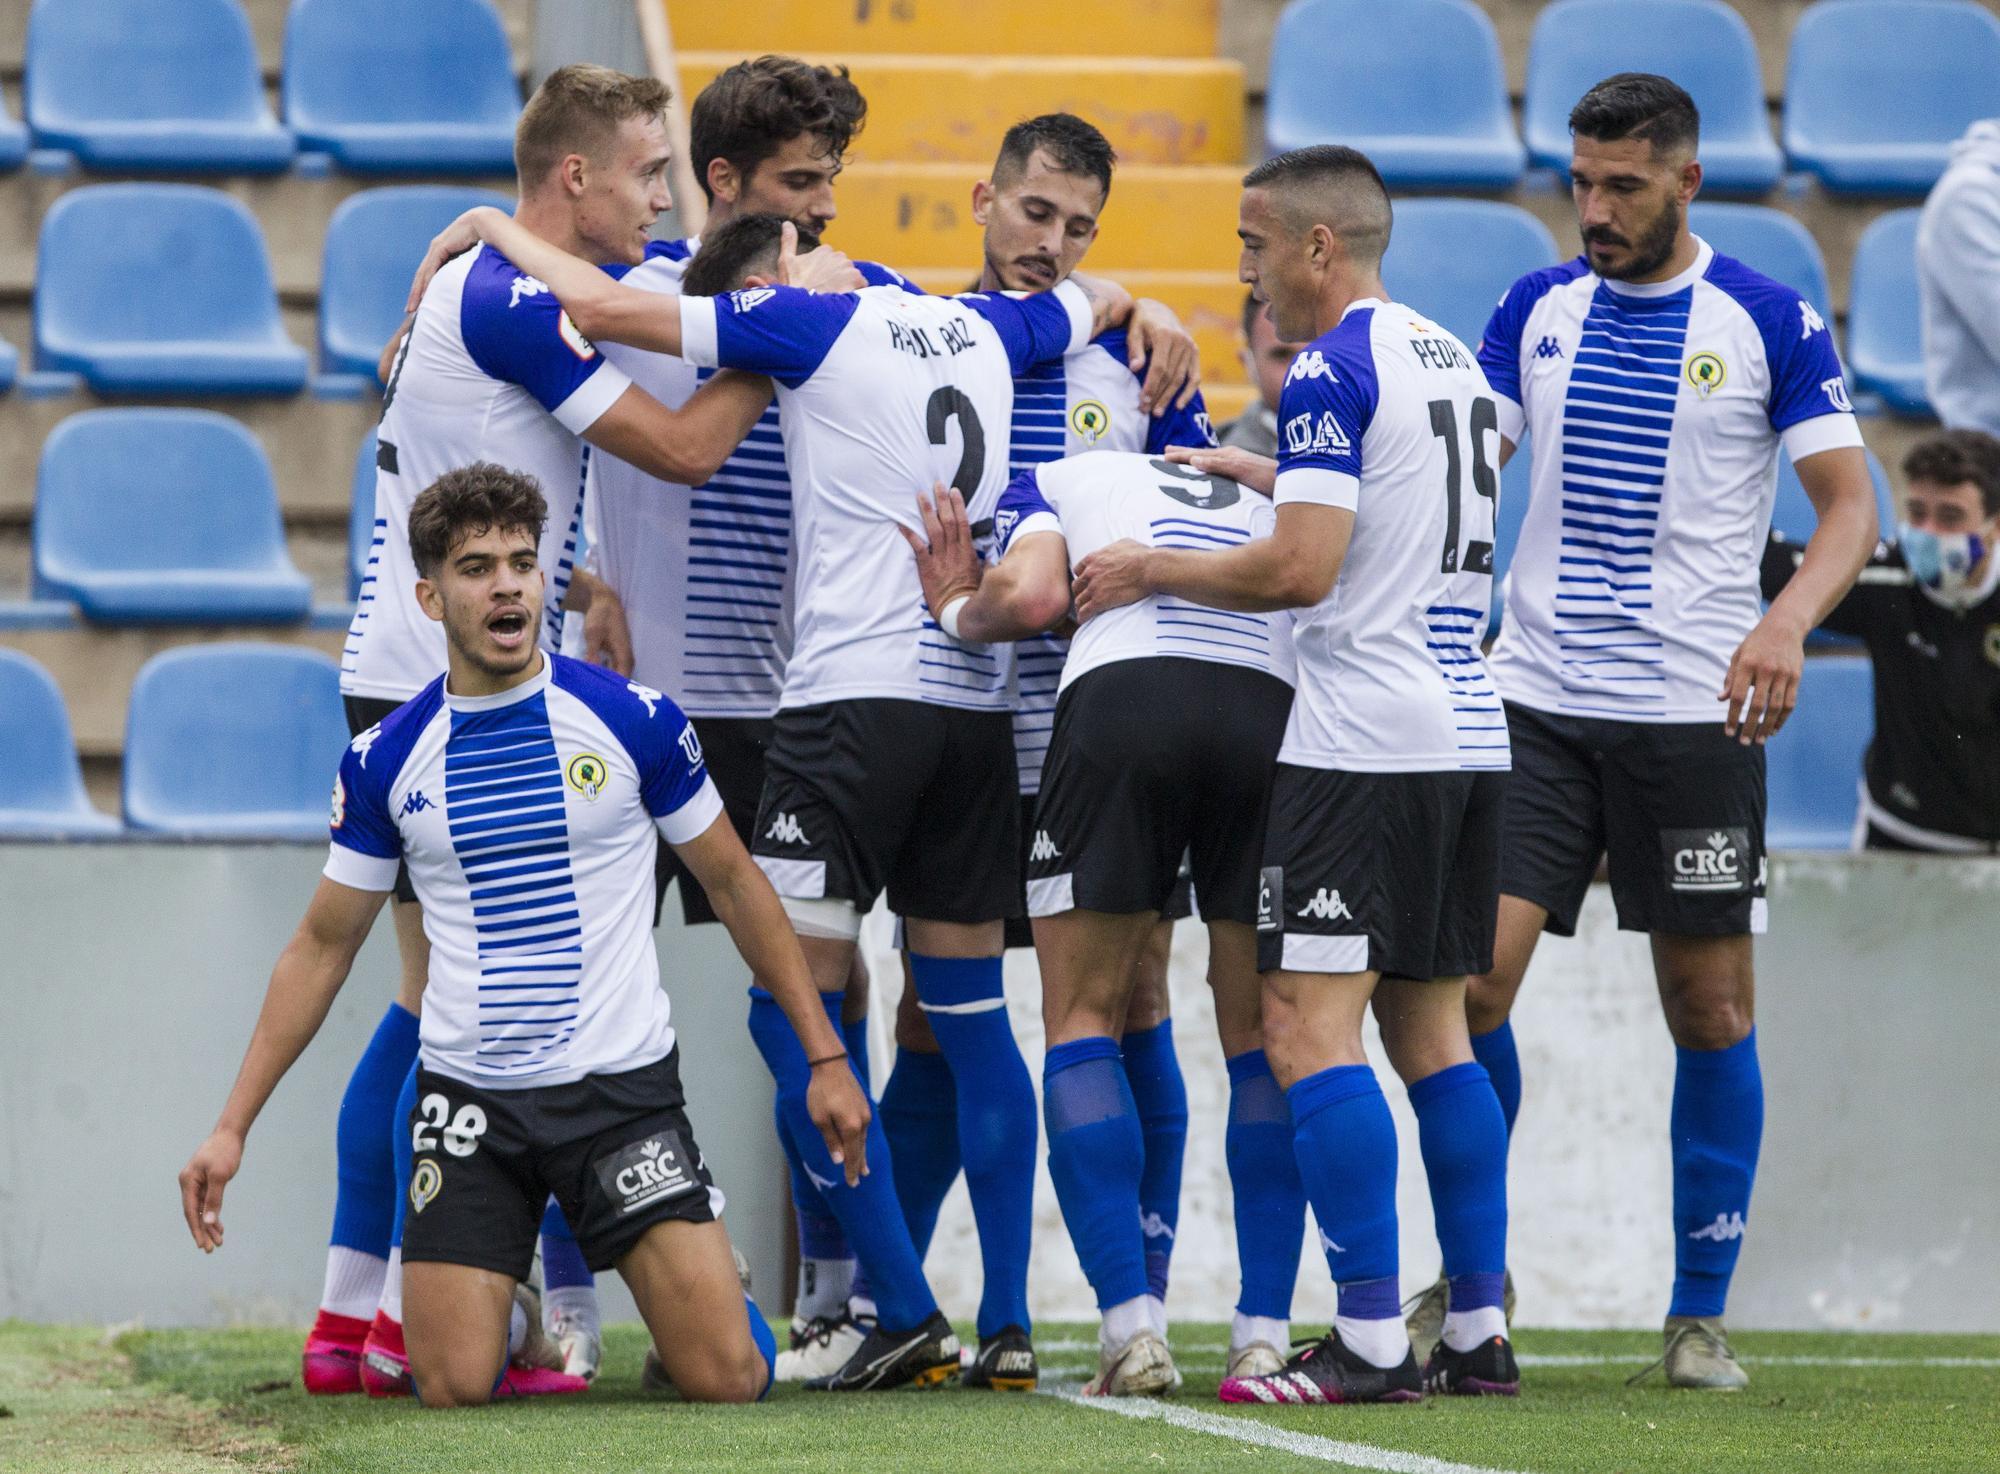 Hércules 3 - Lleida 1